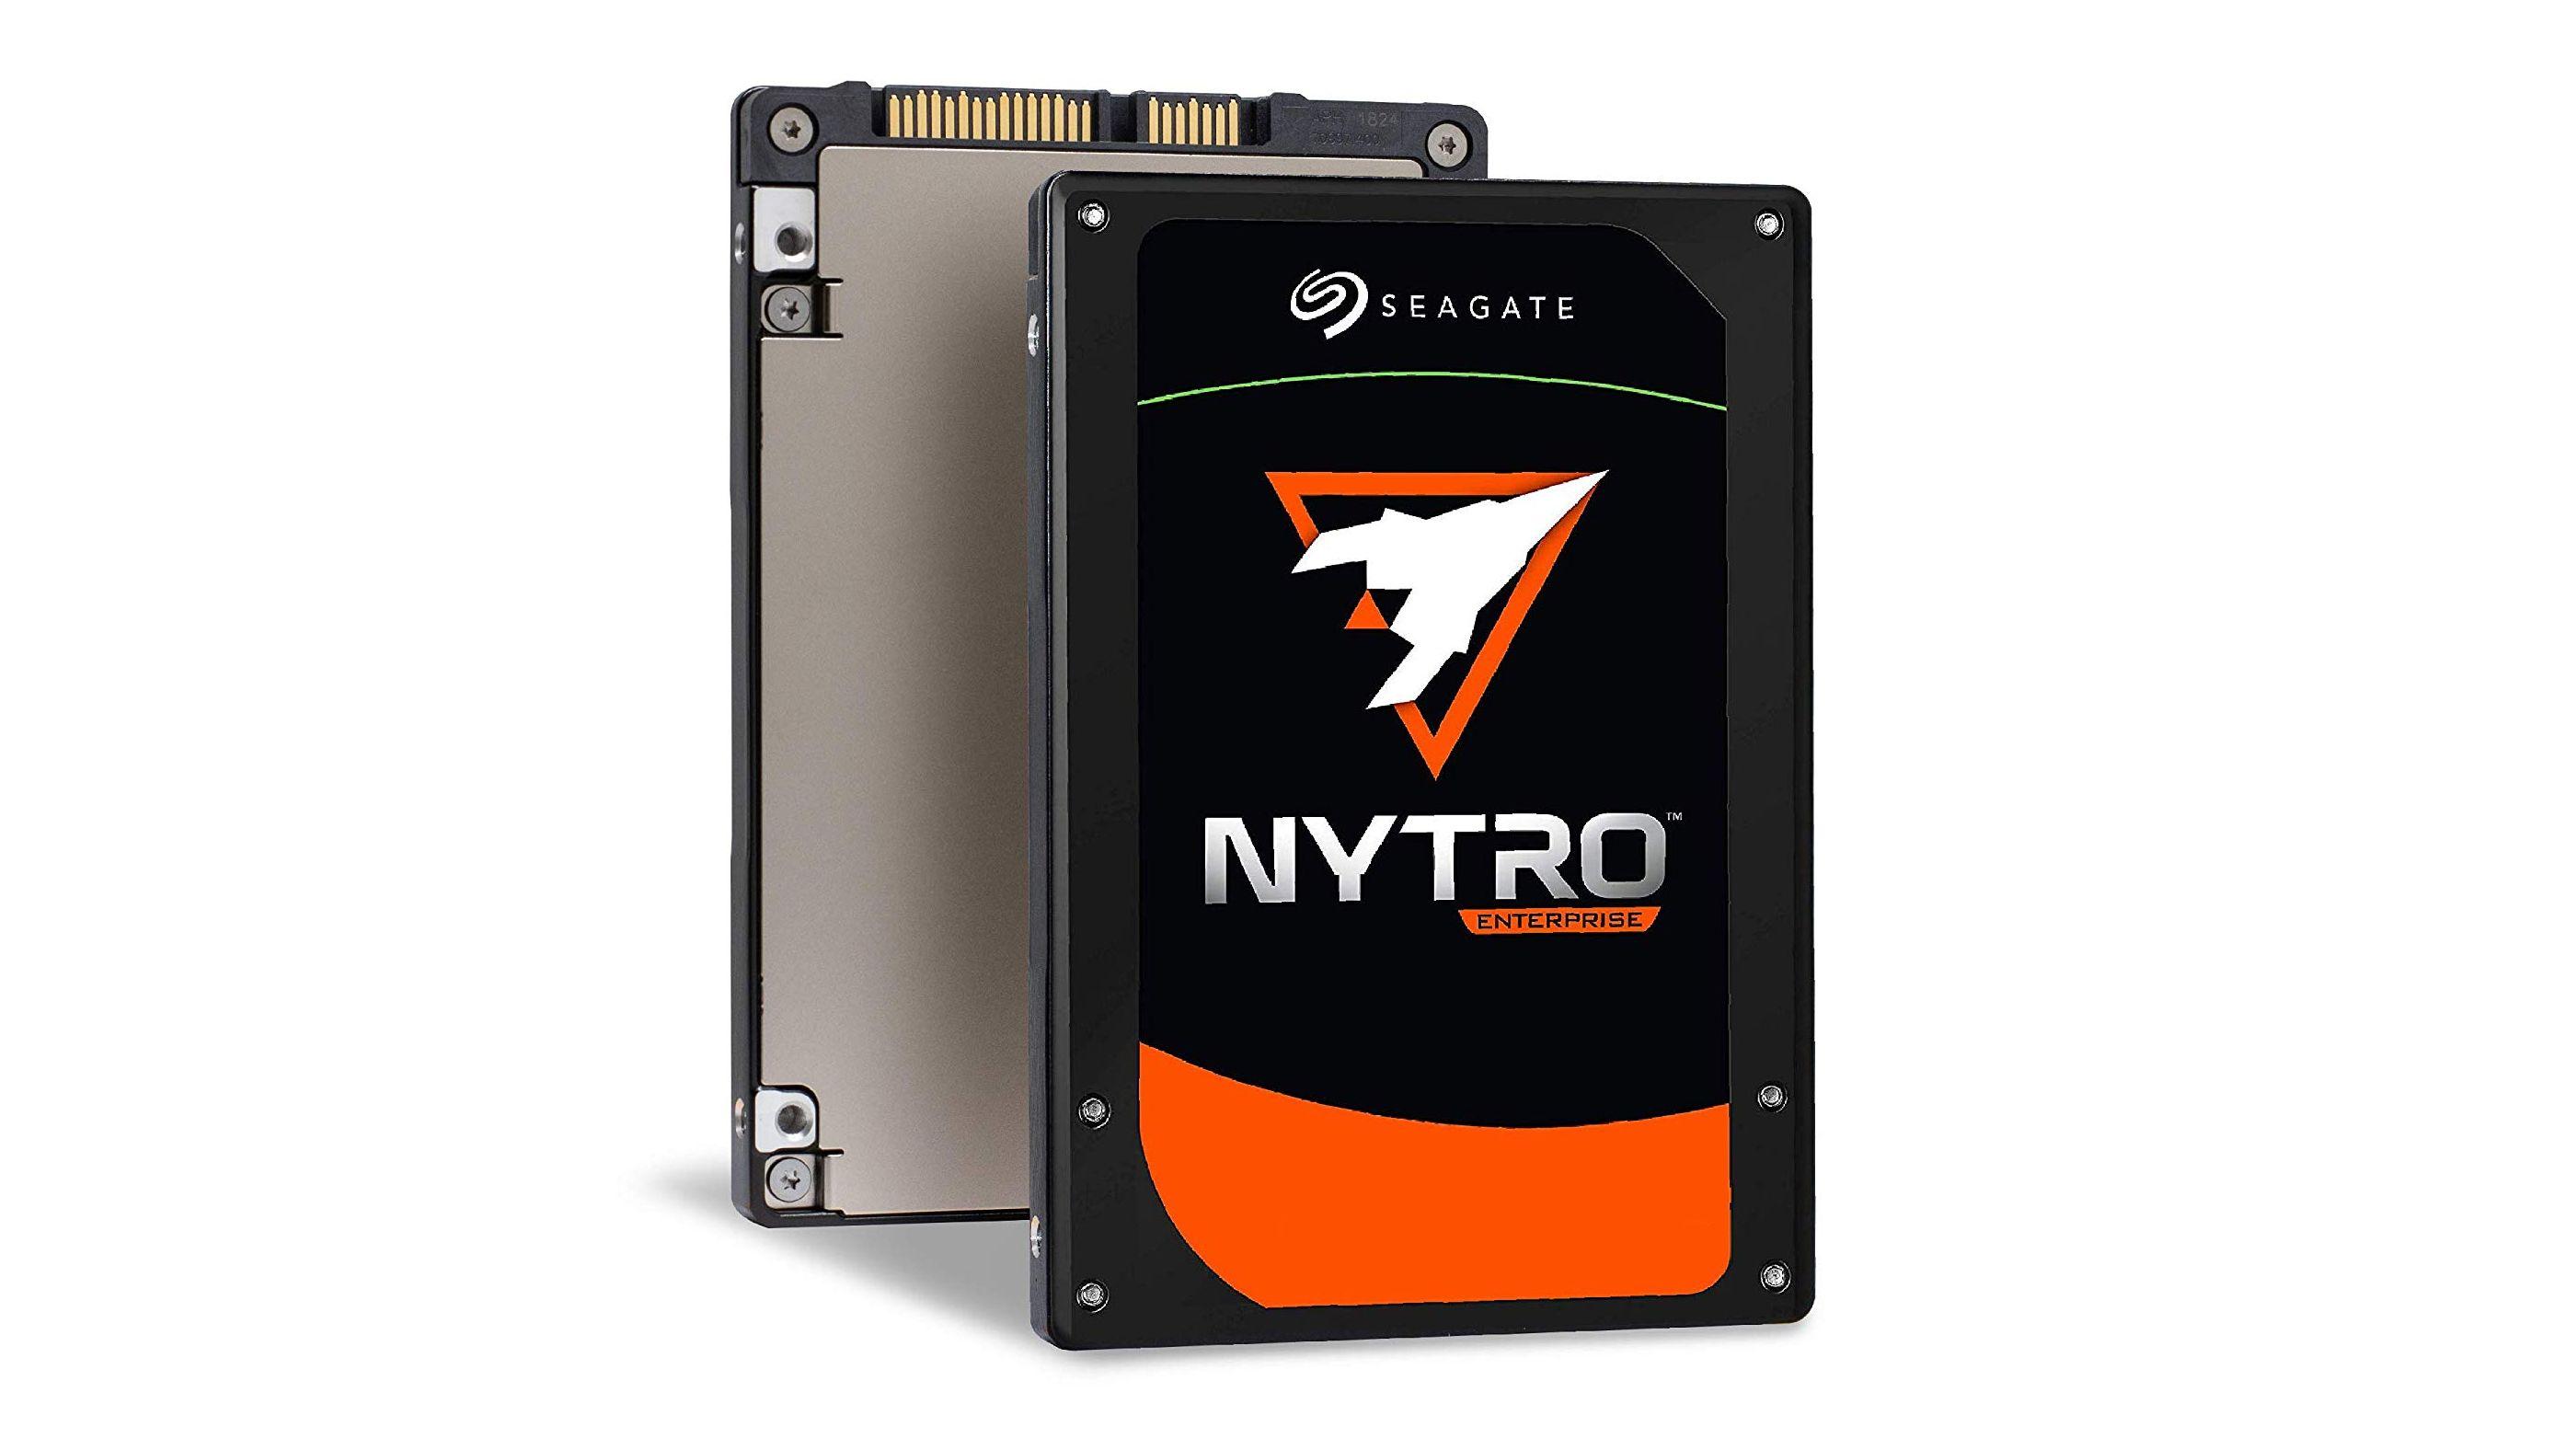 SSD Seagate الالعاب